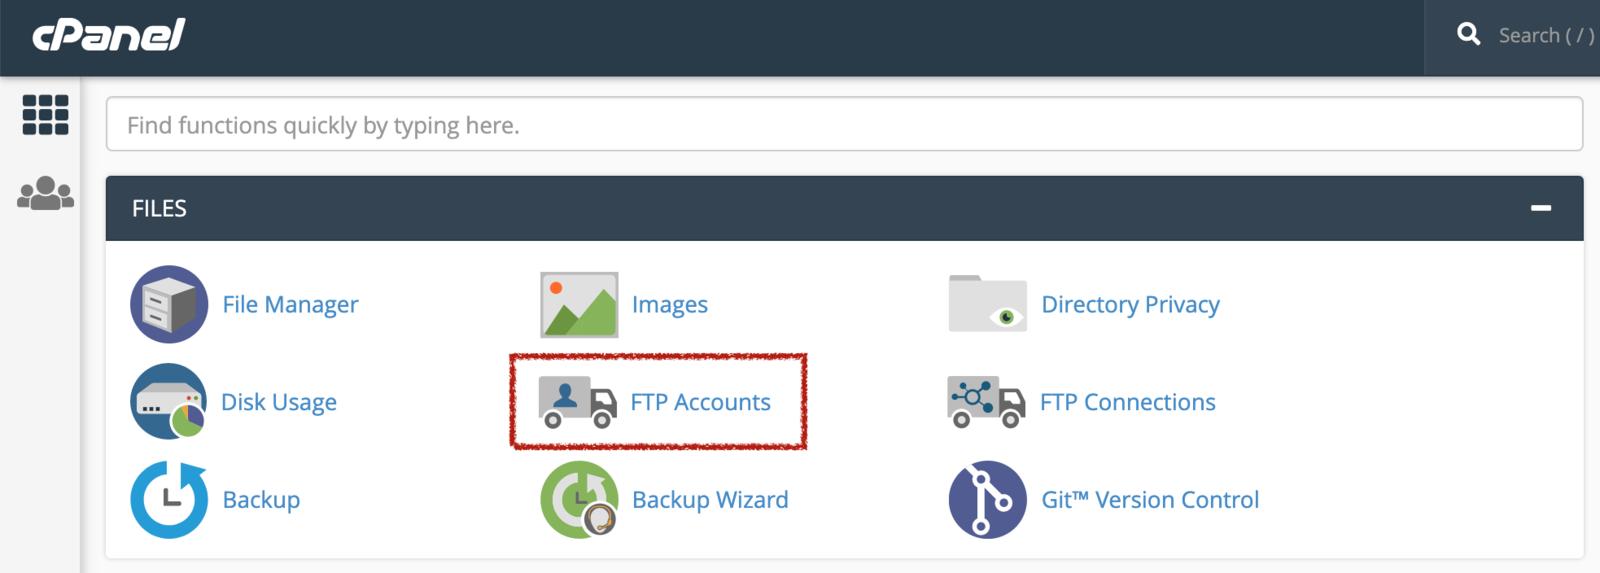 FTP-konti